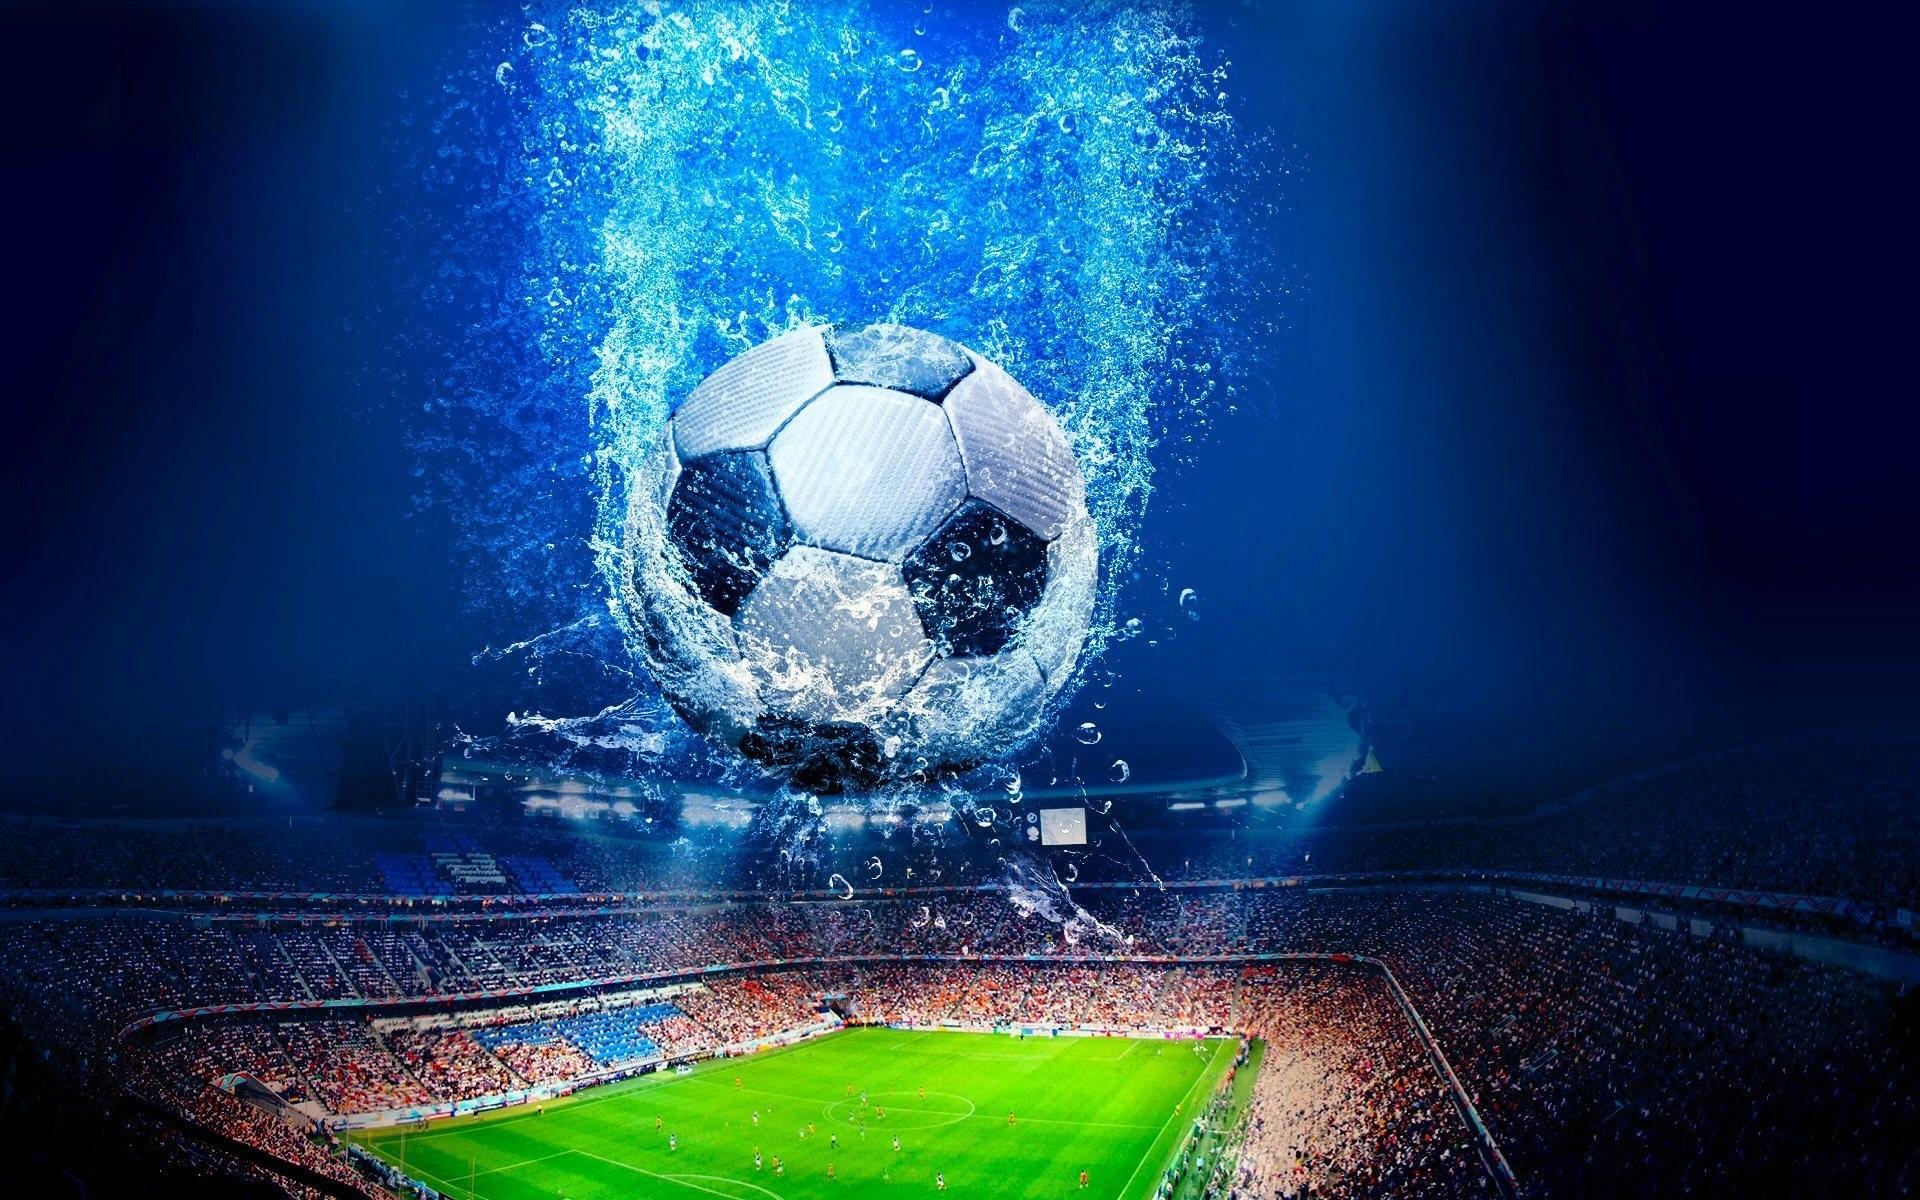 Fantasy Football HD Wallpapers 9 #FantasyFootballHDWallpapers  #FantasyFootball #fantasy #football #soccer #